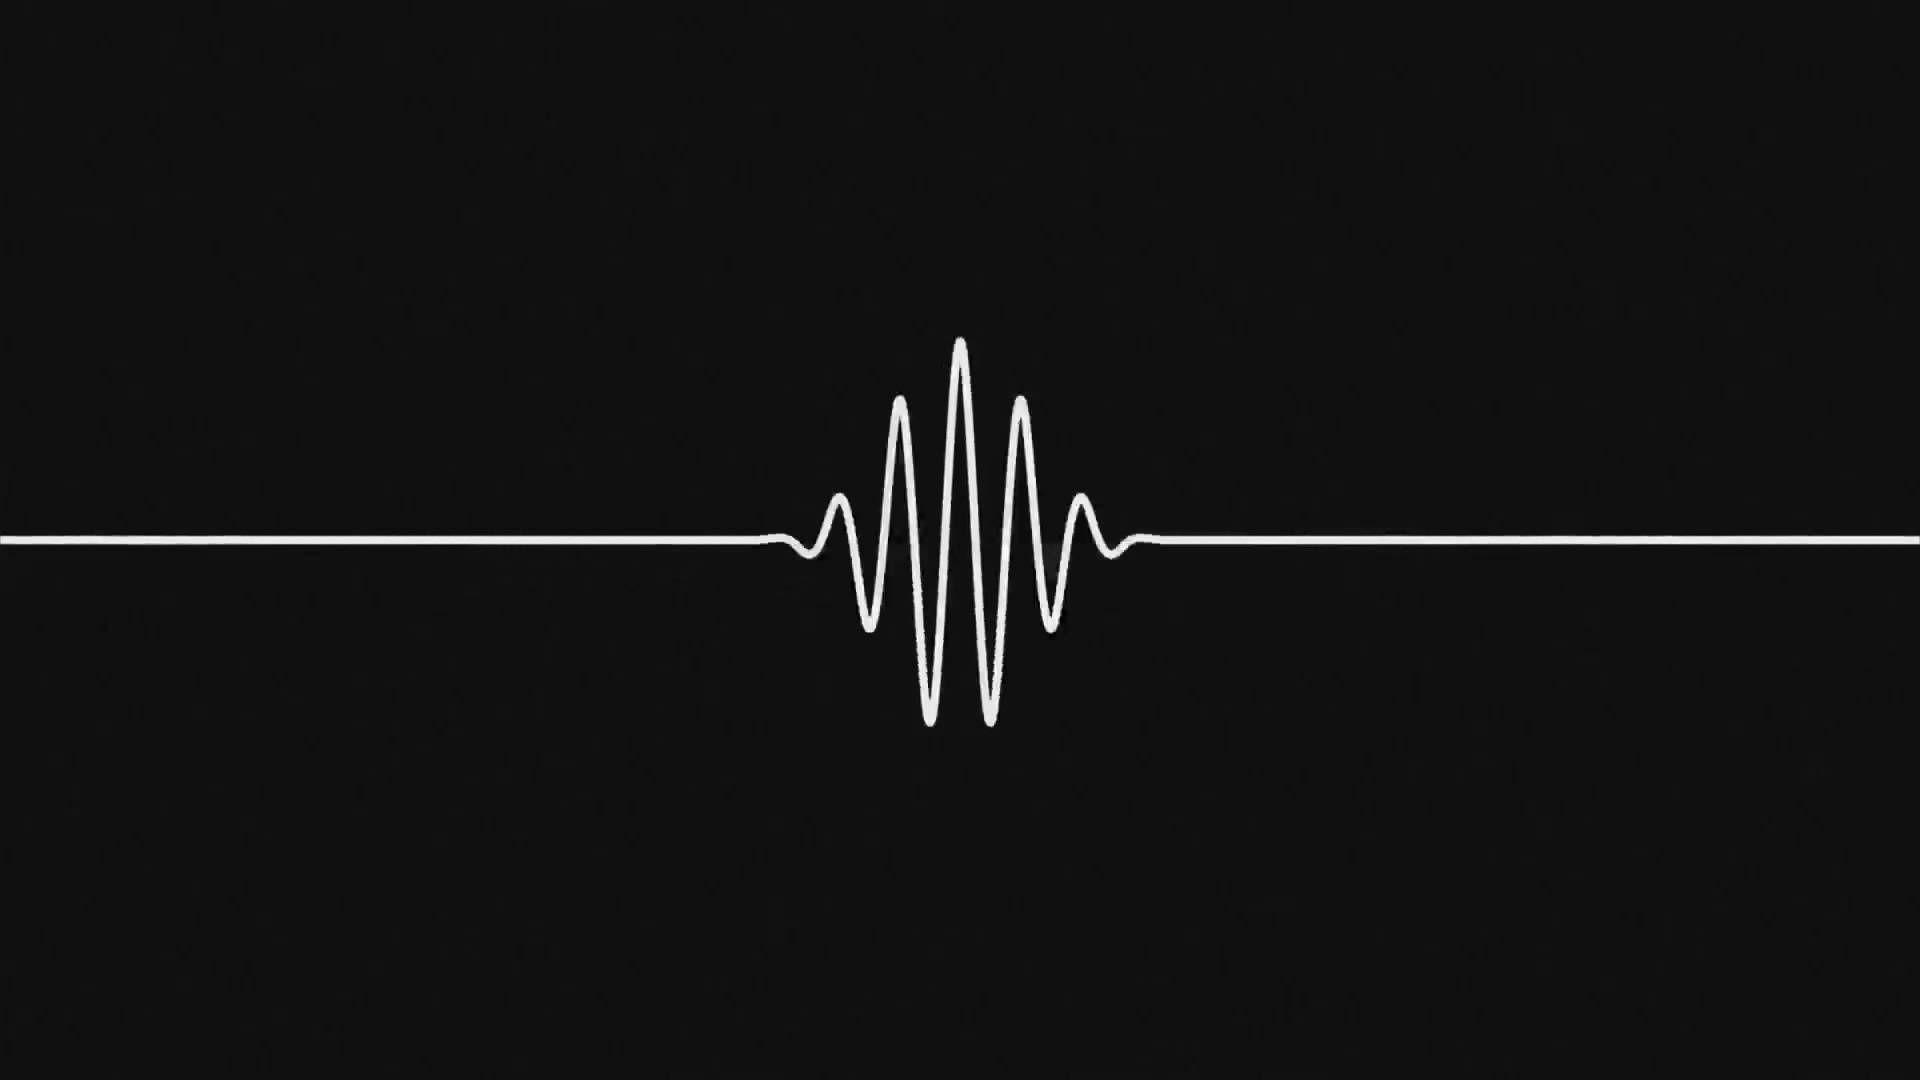 Arctic Monkeys IPhone Wallpaper (74+ Images